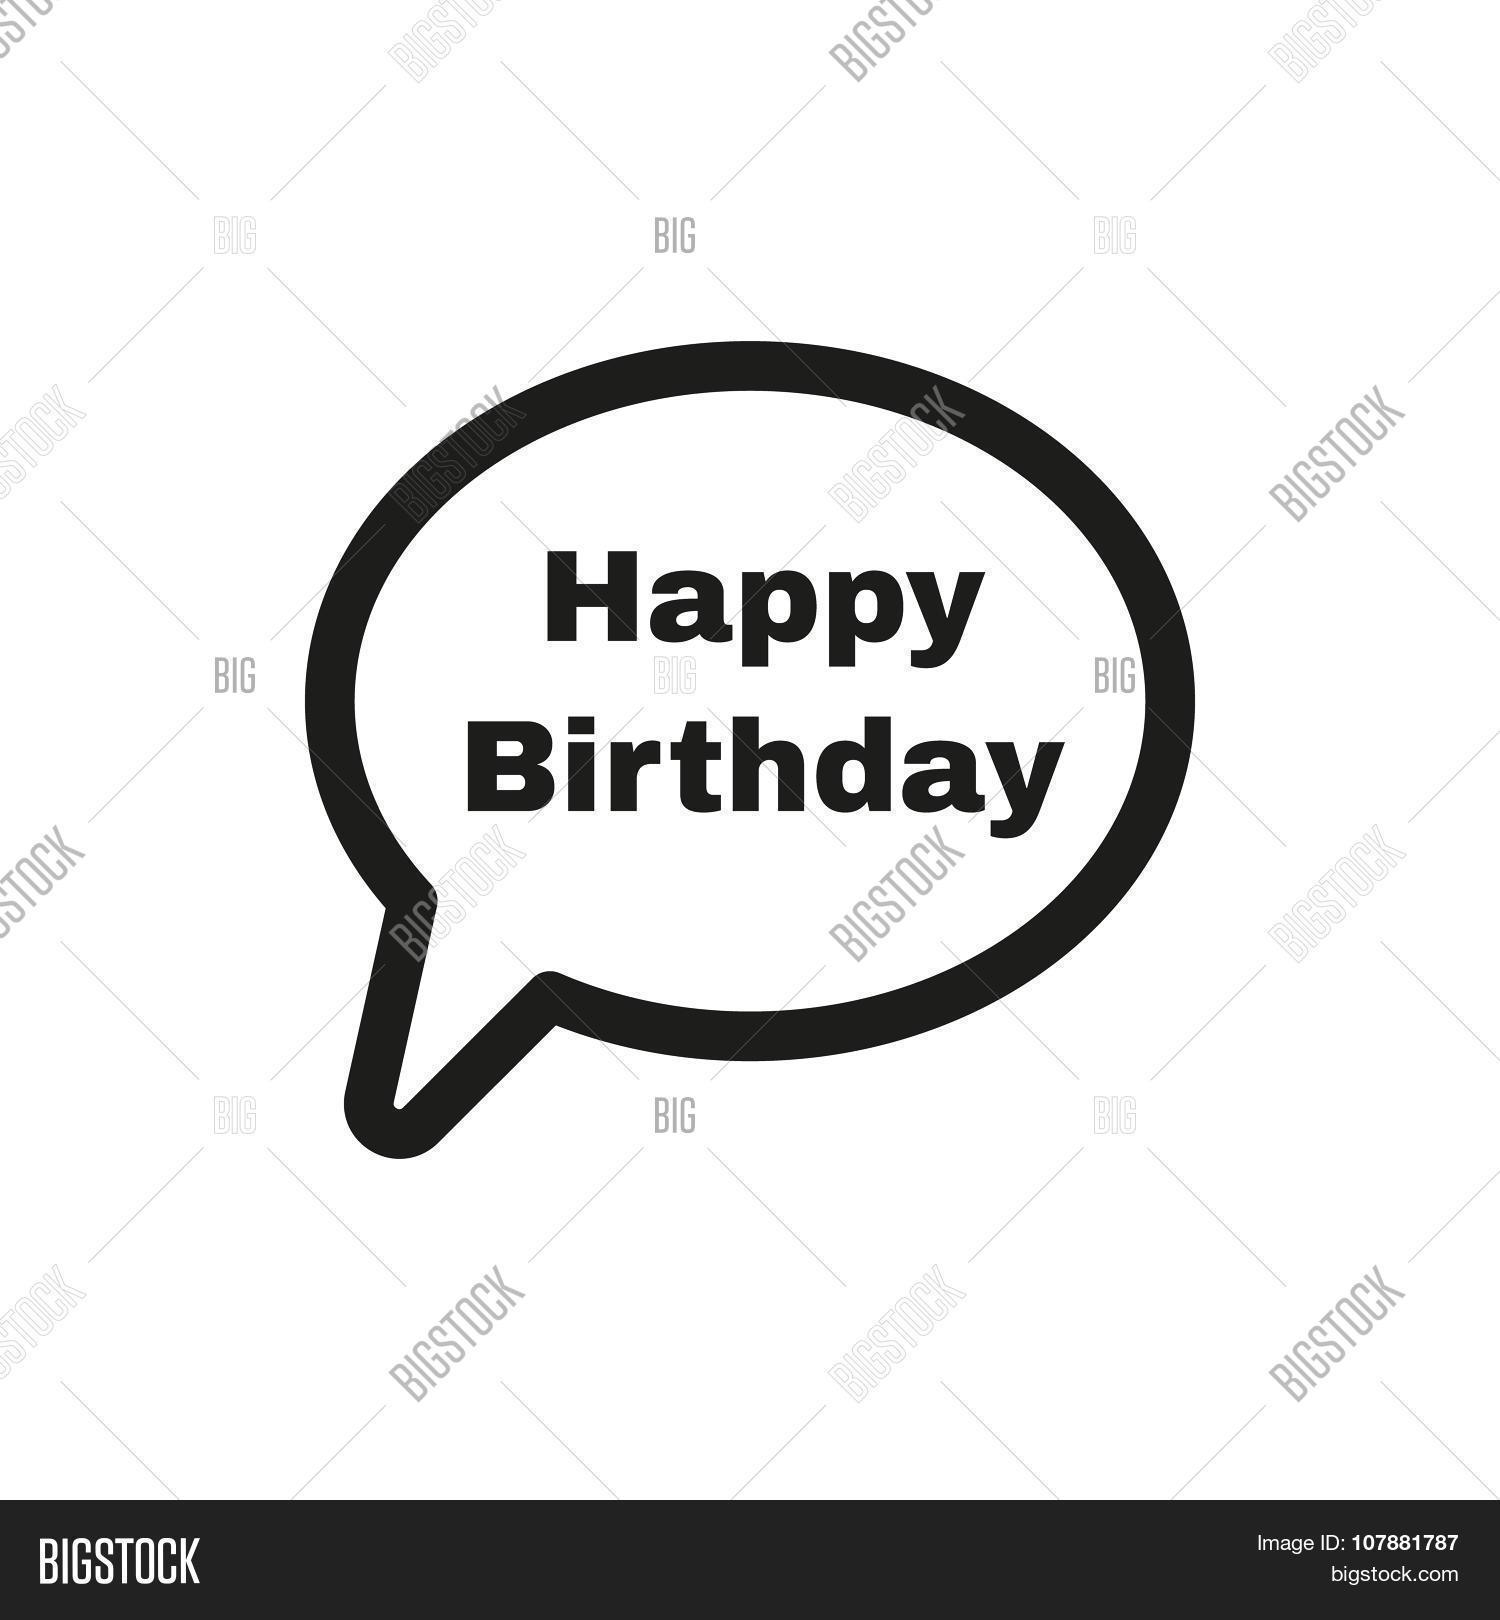 Speech bubble word happy birthday vector photo bigstock the speech bubble with the word happy birthday icon celebration and feast day buycottarizona